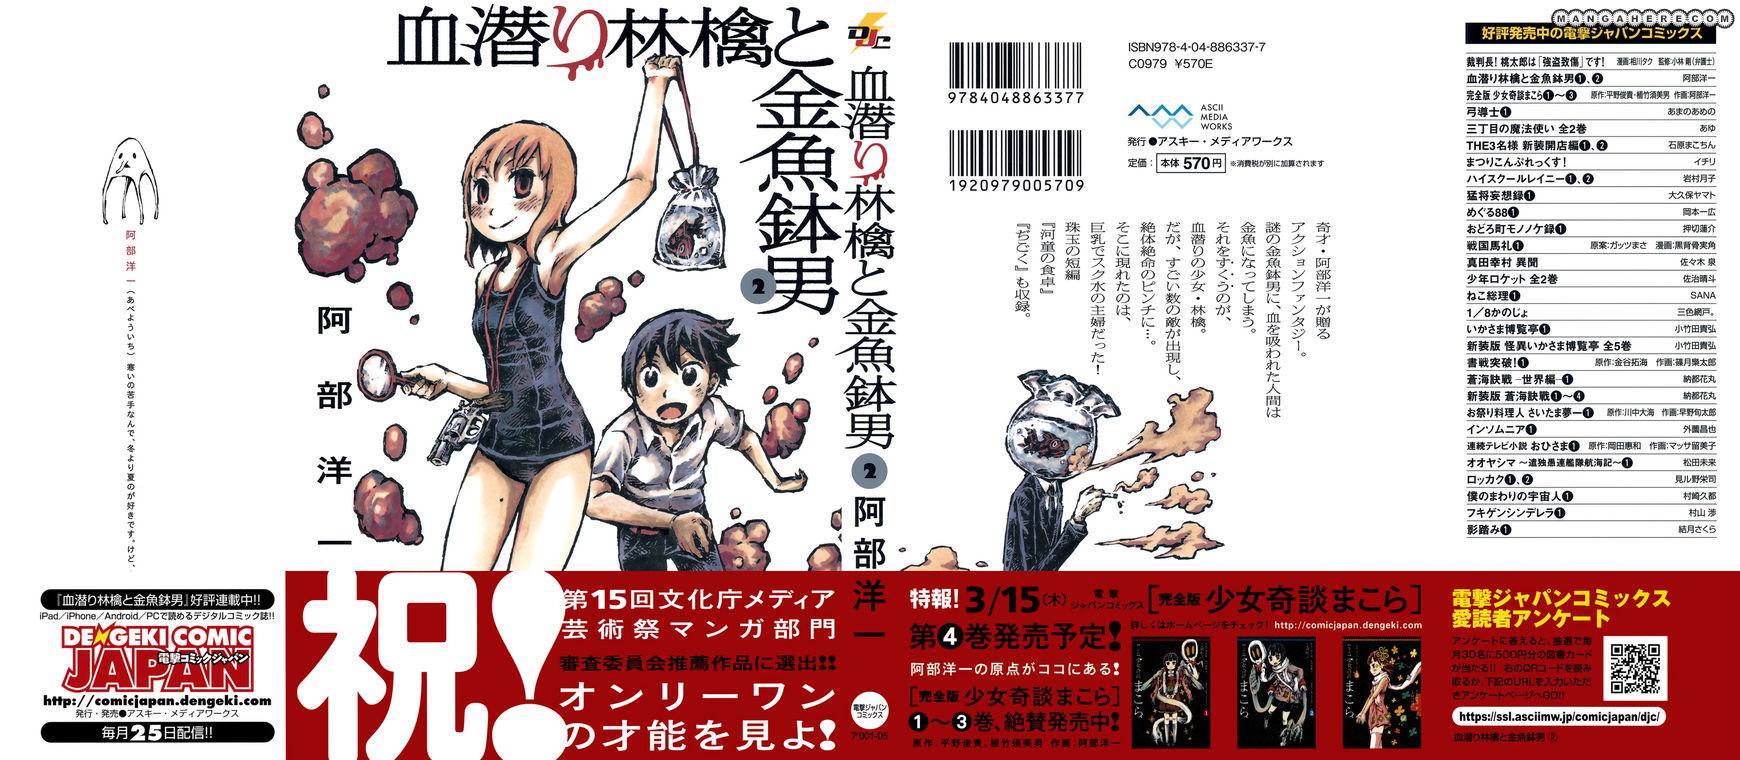 Chimoguri Ringo to Kingyobachi Otoko 8 Page 2